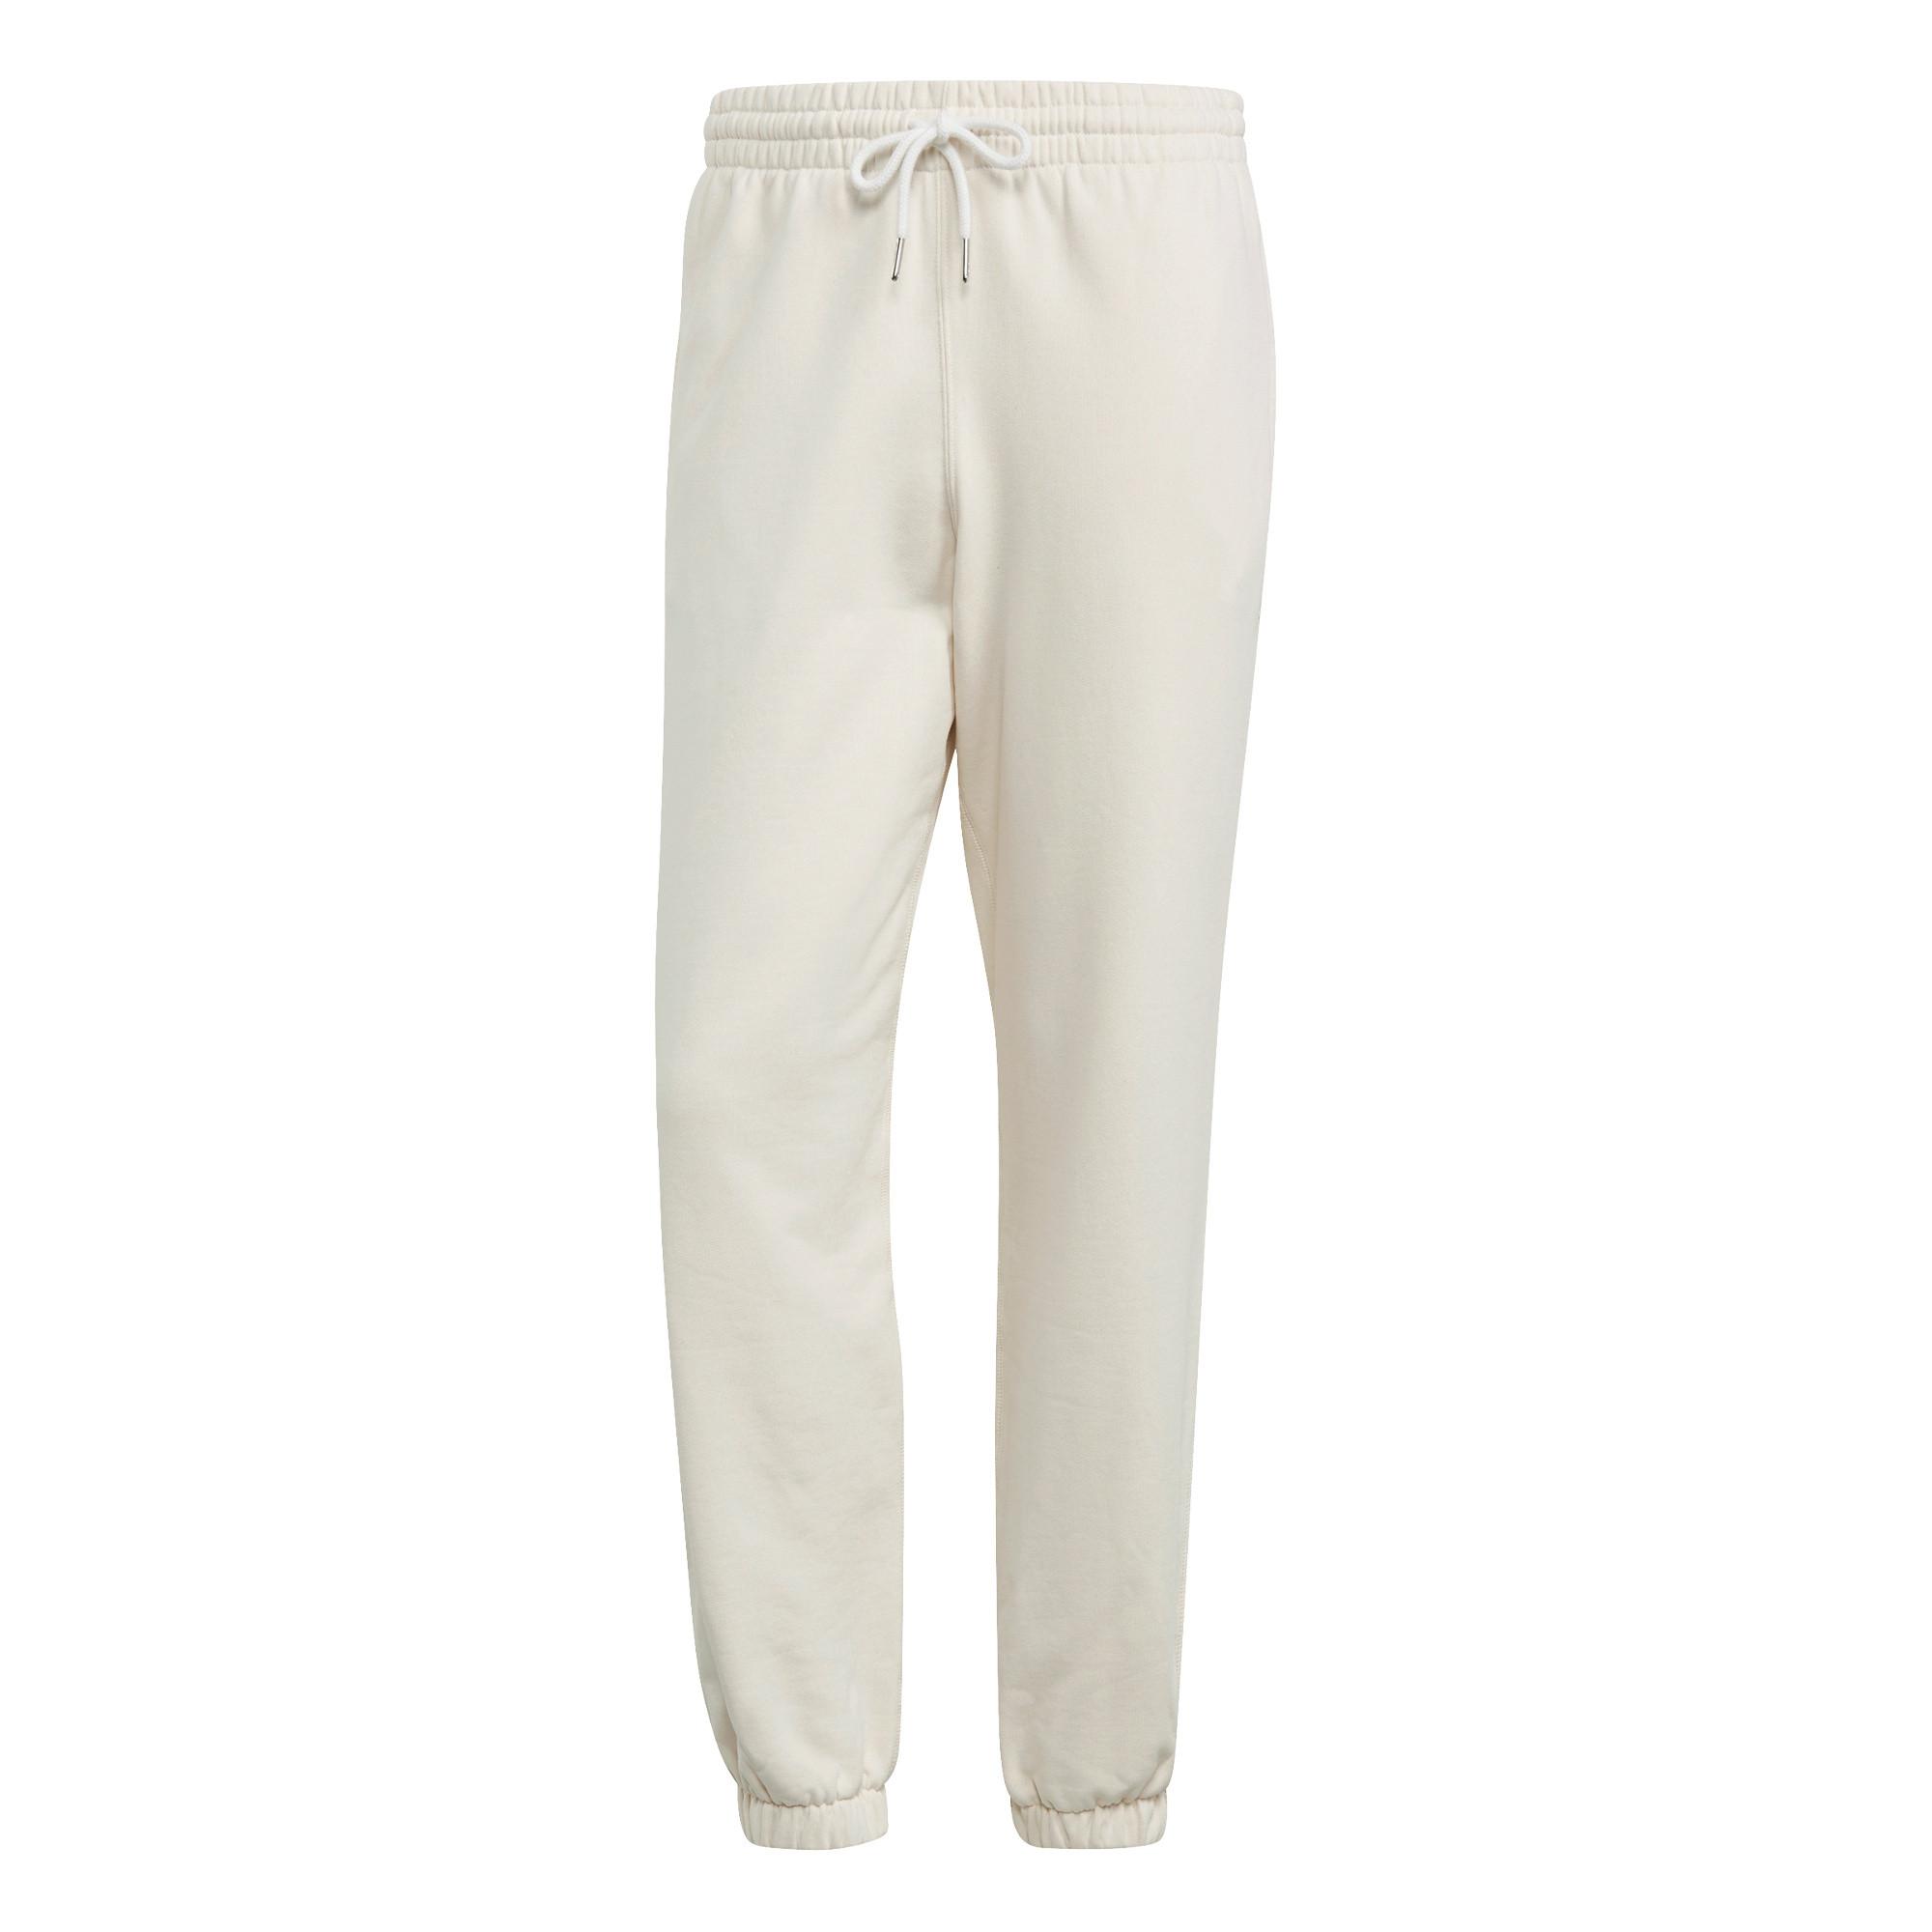 Pantaloni tuta adicolor Premium, Bianco panna, large image number 0